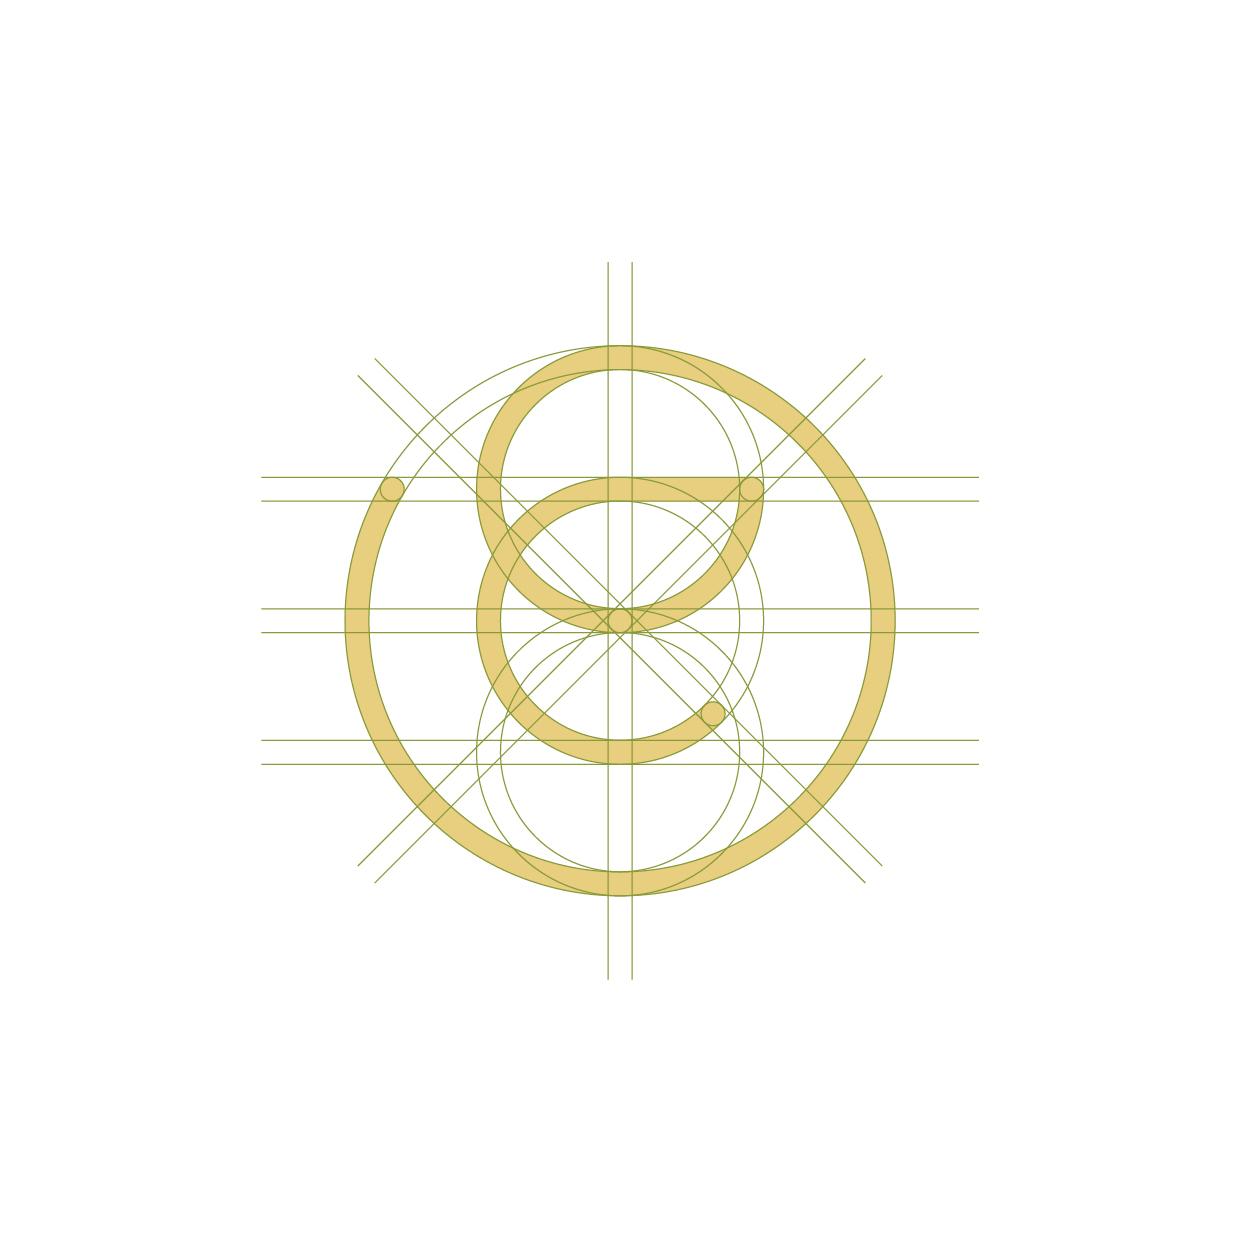 símbolo de marca